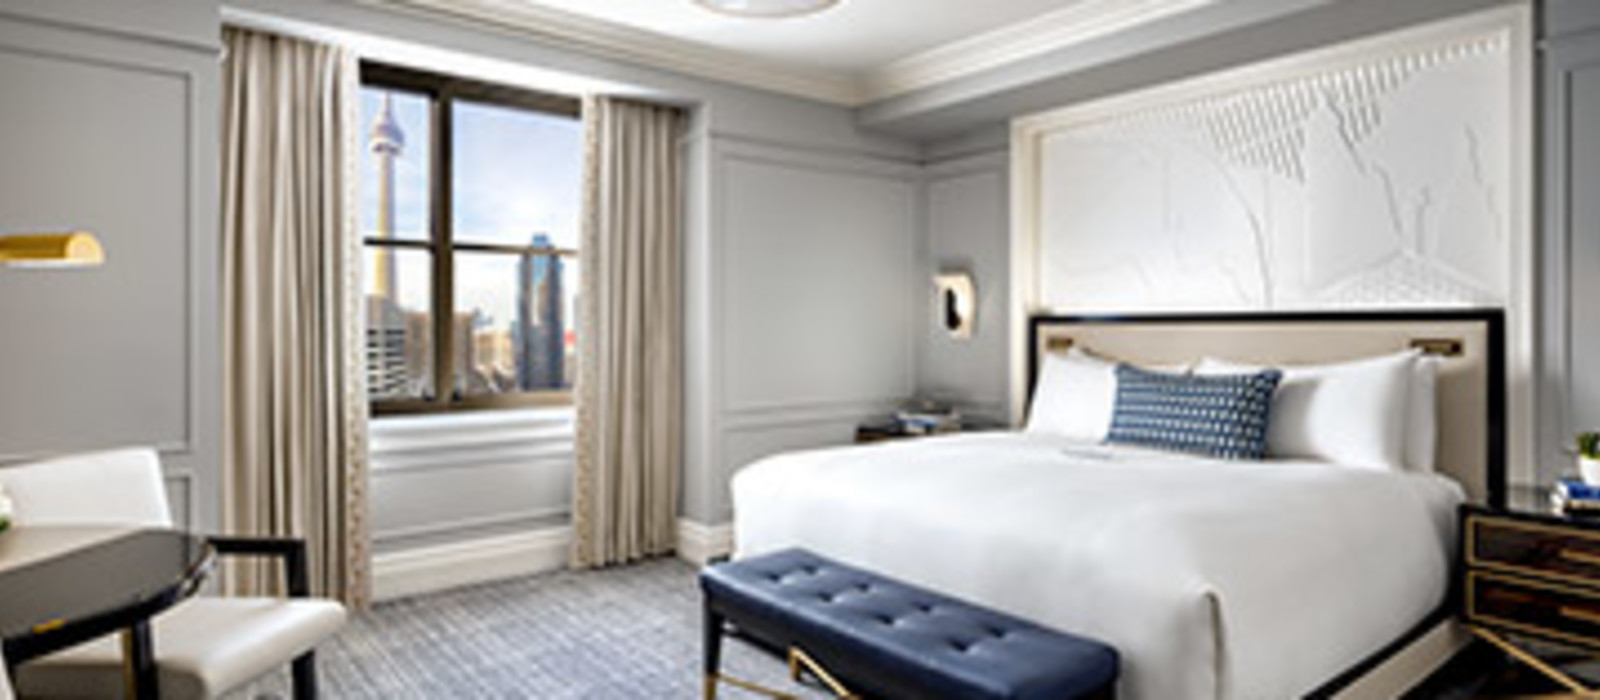 Hotel Fairmont Royal York Canada